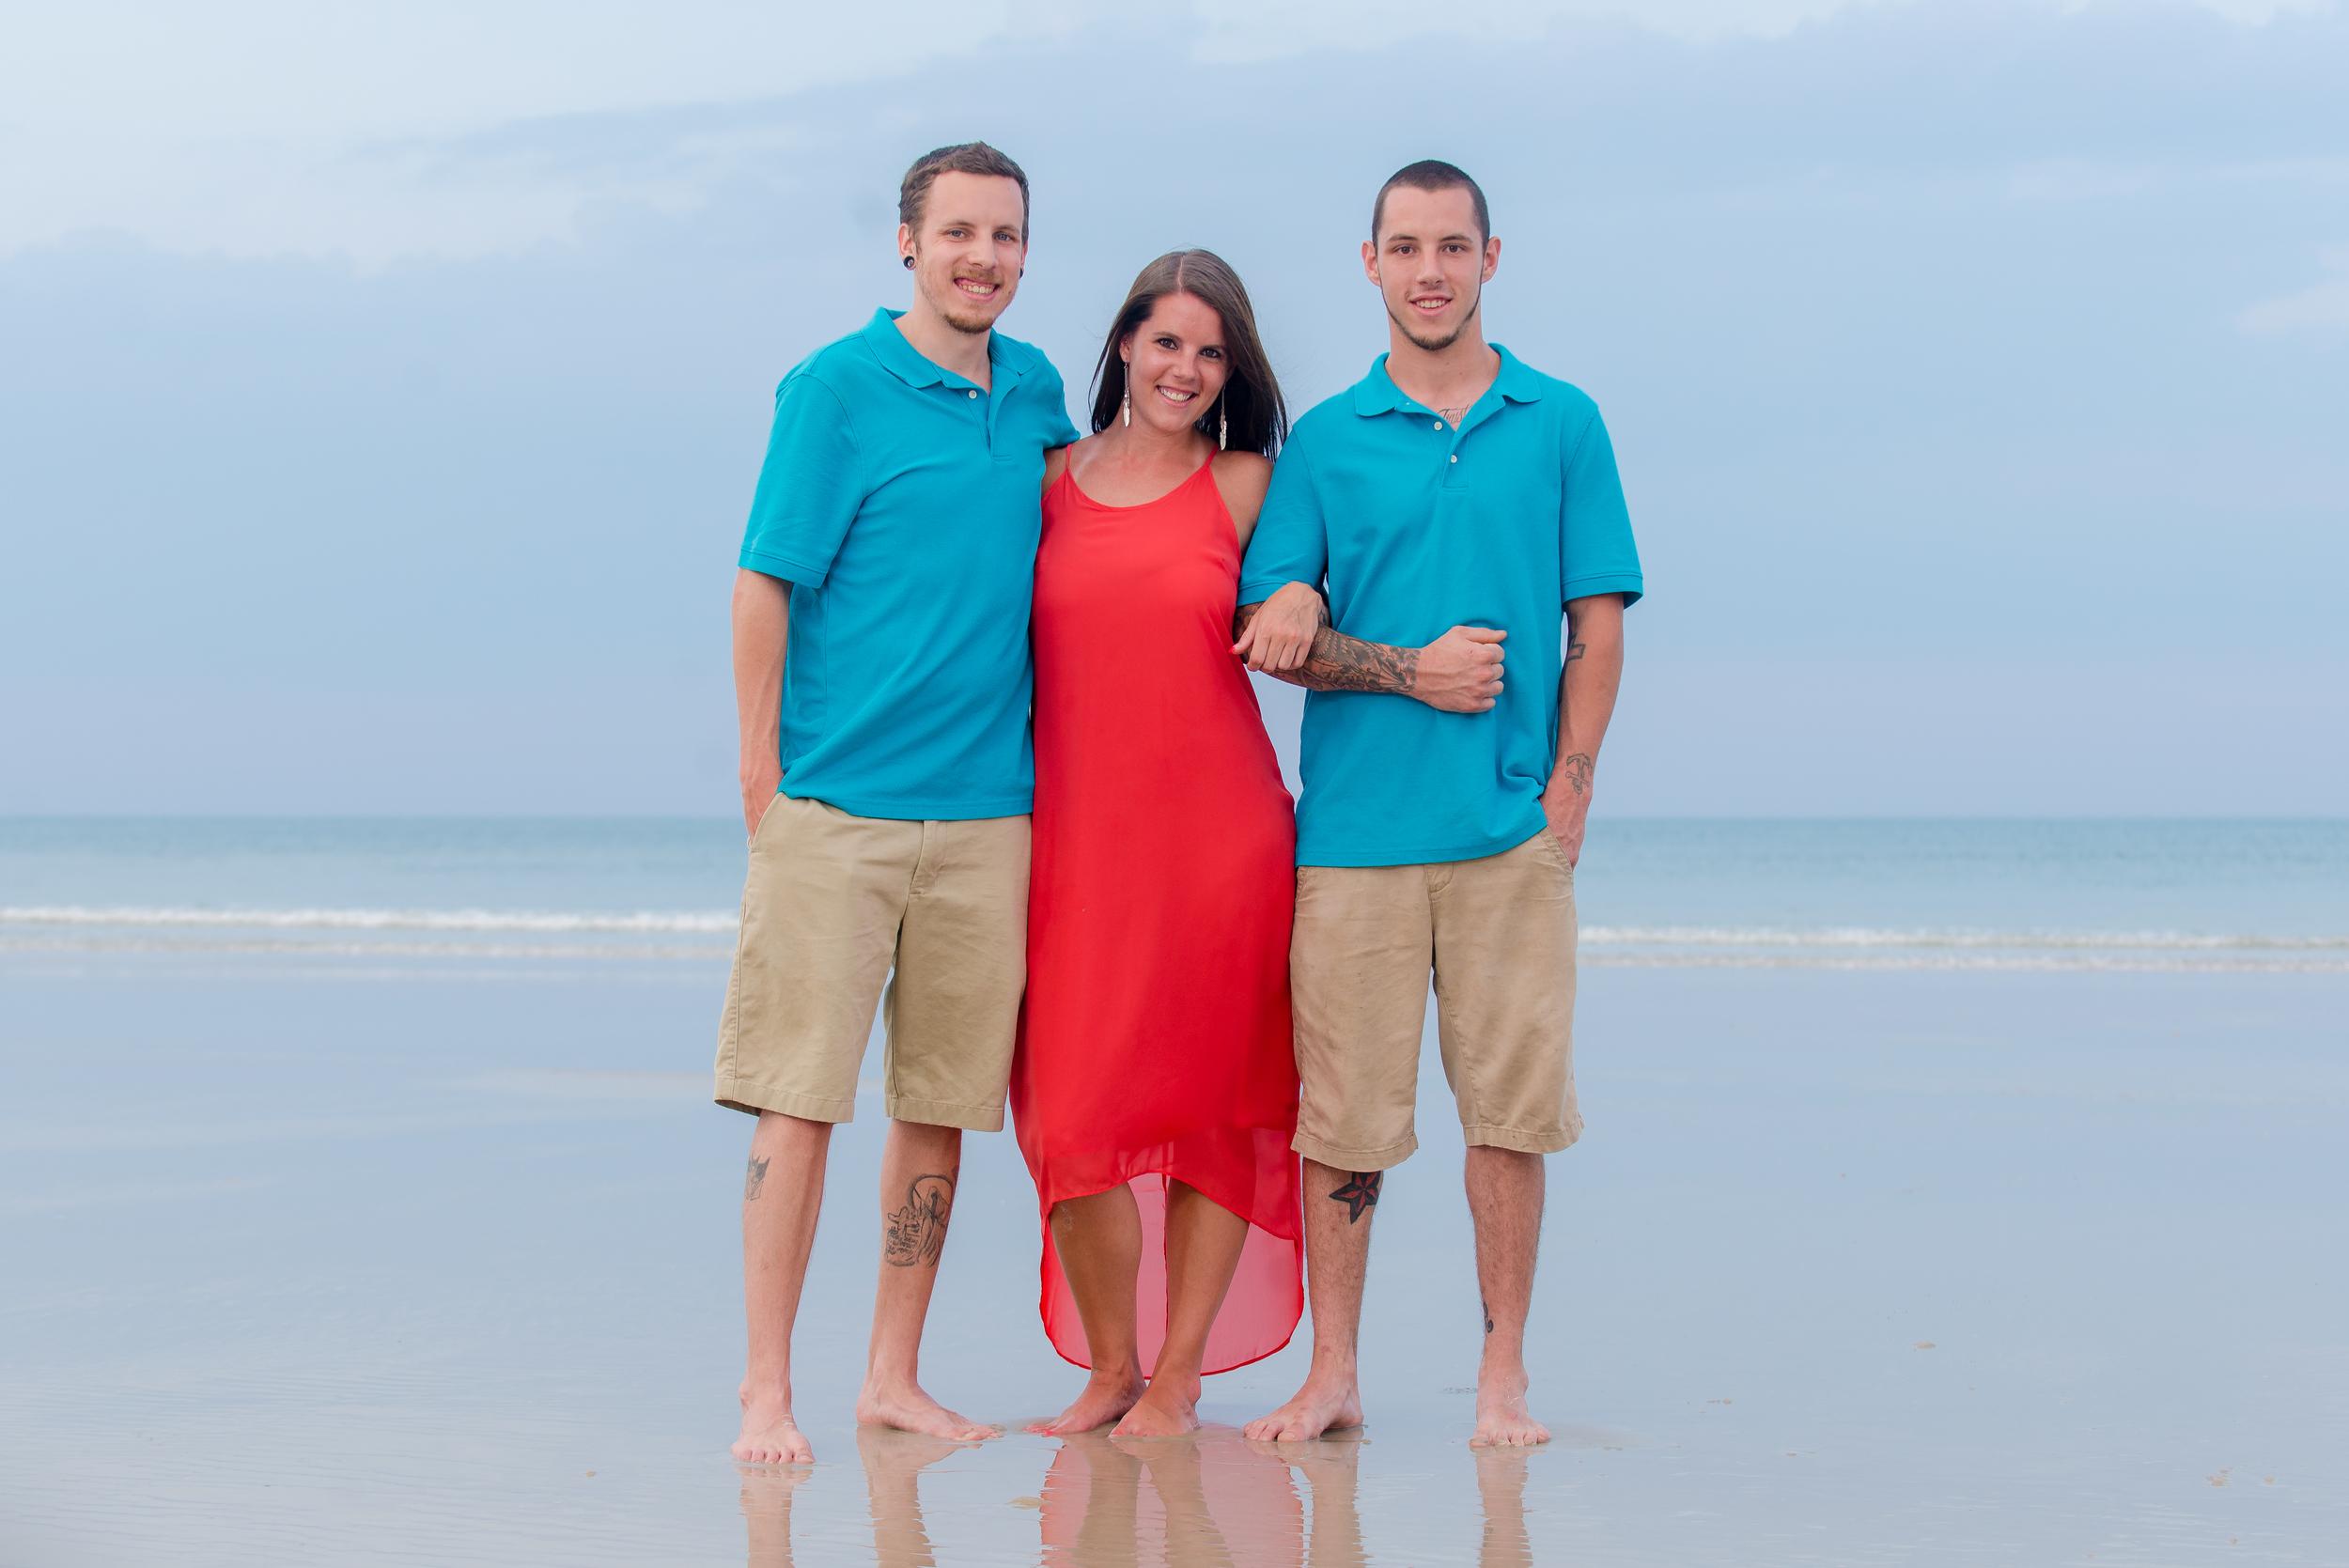 st-augustine-beach-family-portraits